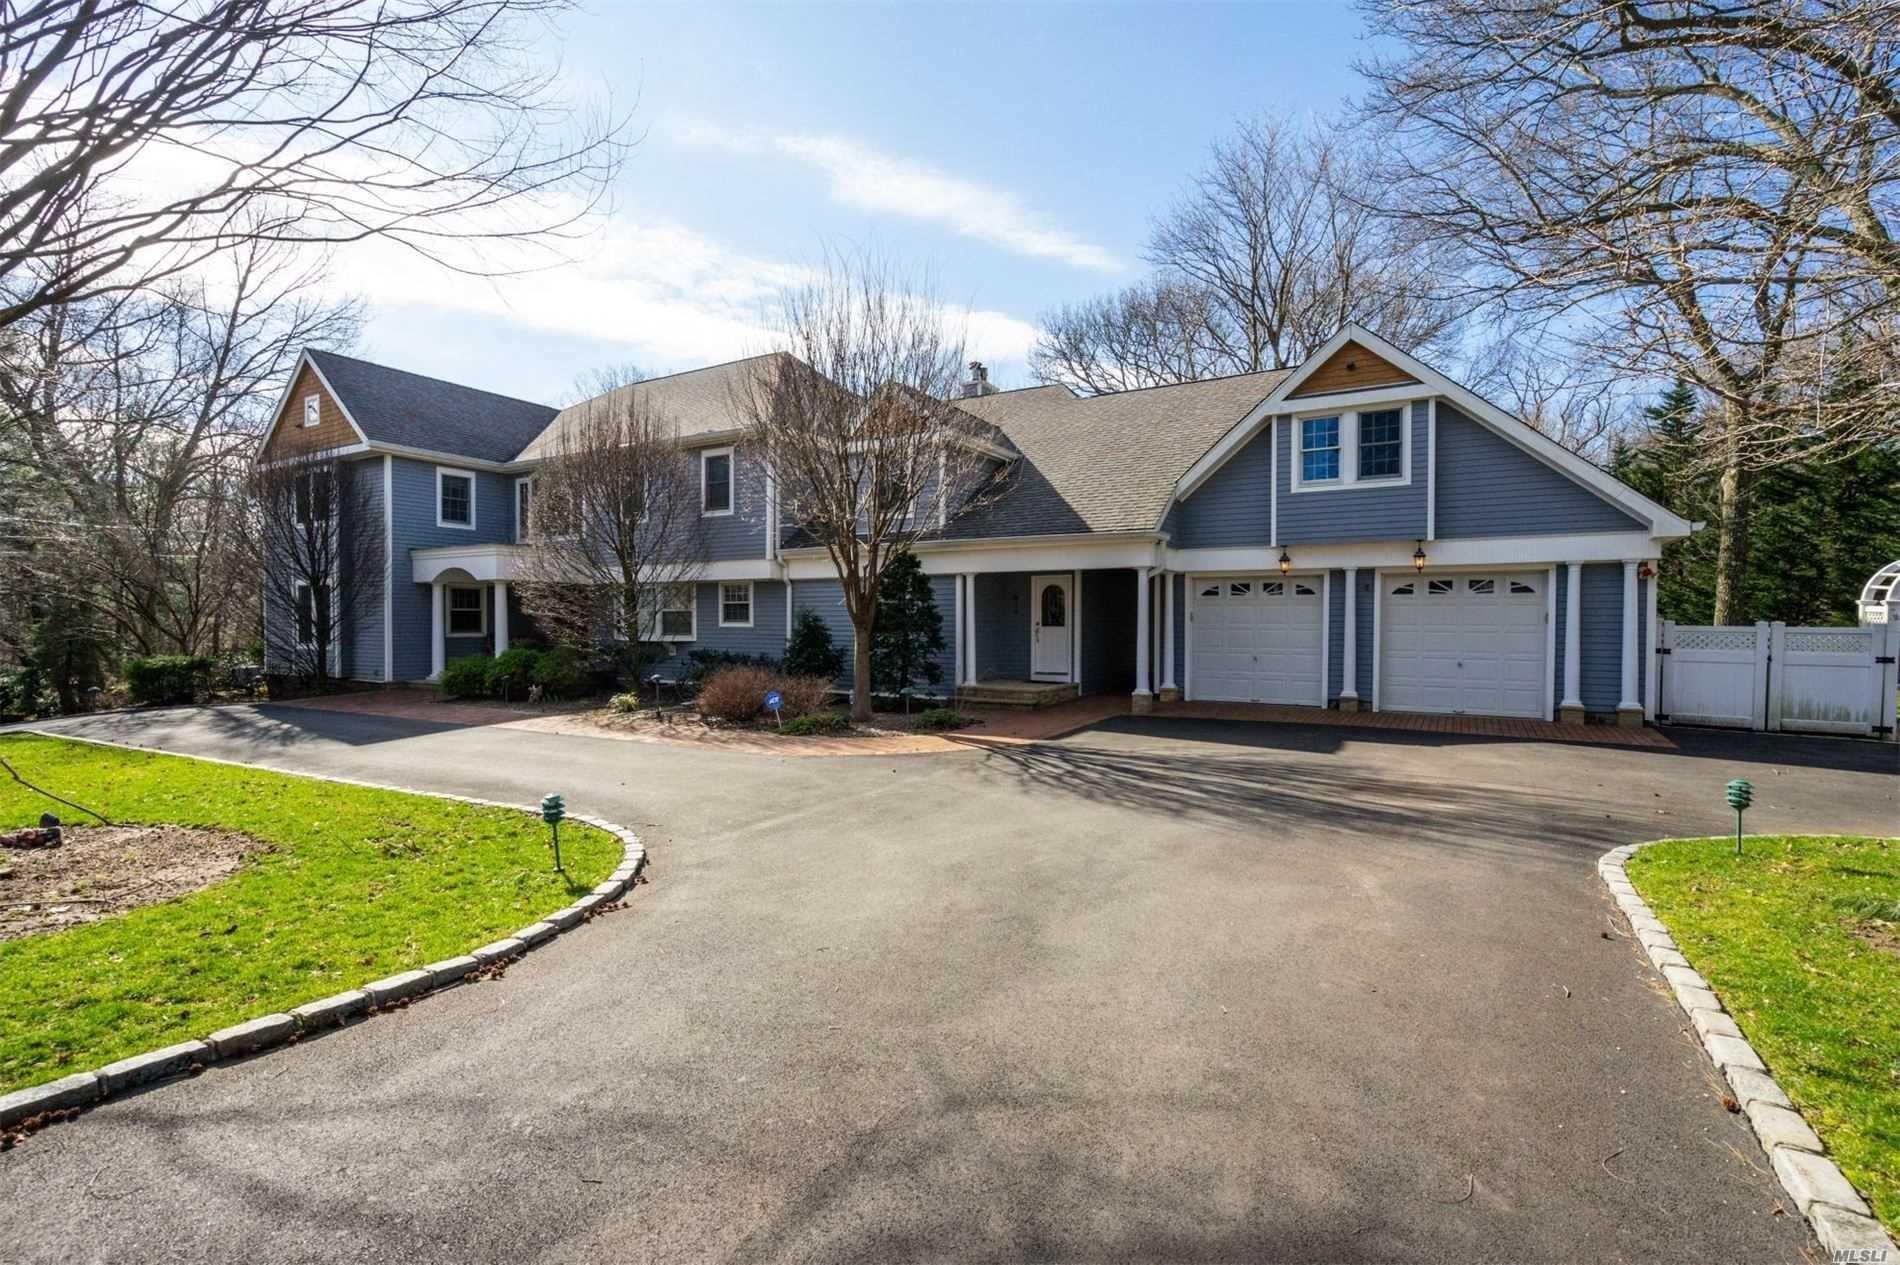 Photo of 28 Shady Lane, Laurel Hollow, NY 11791 (MLS # 3215444)